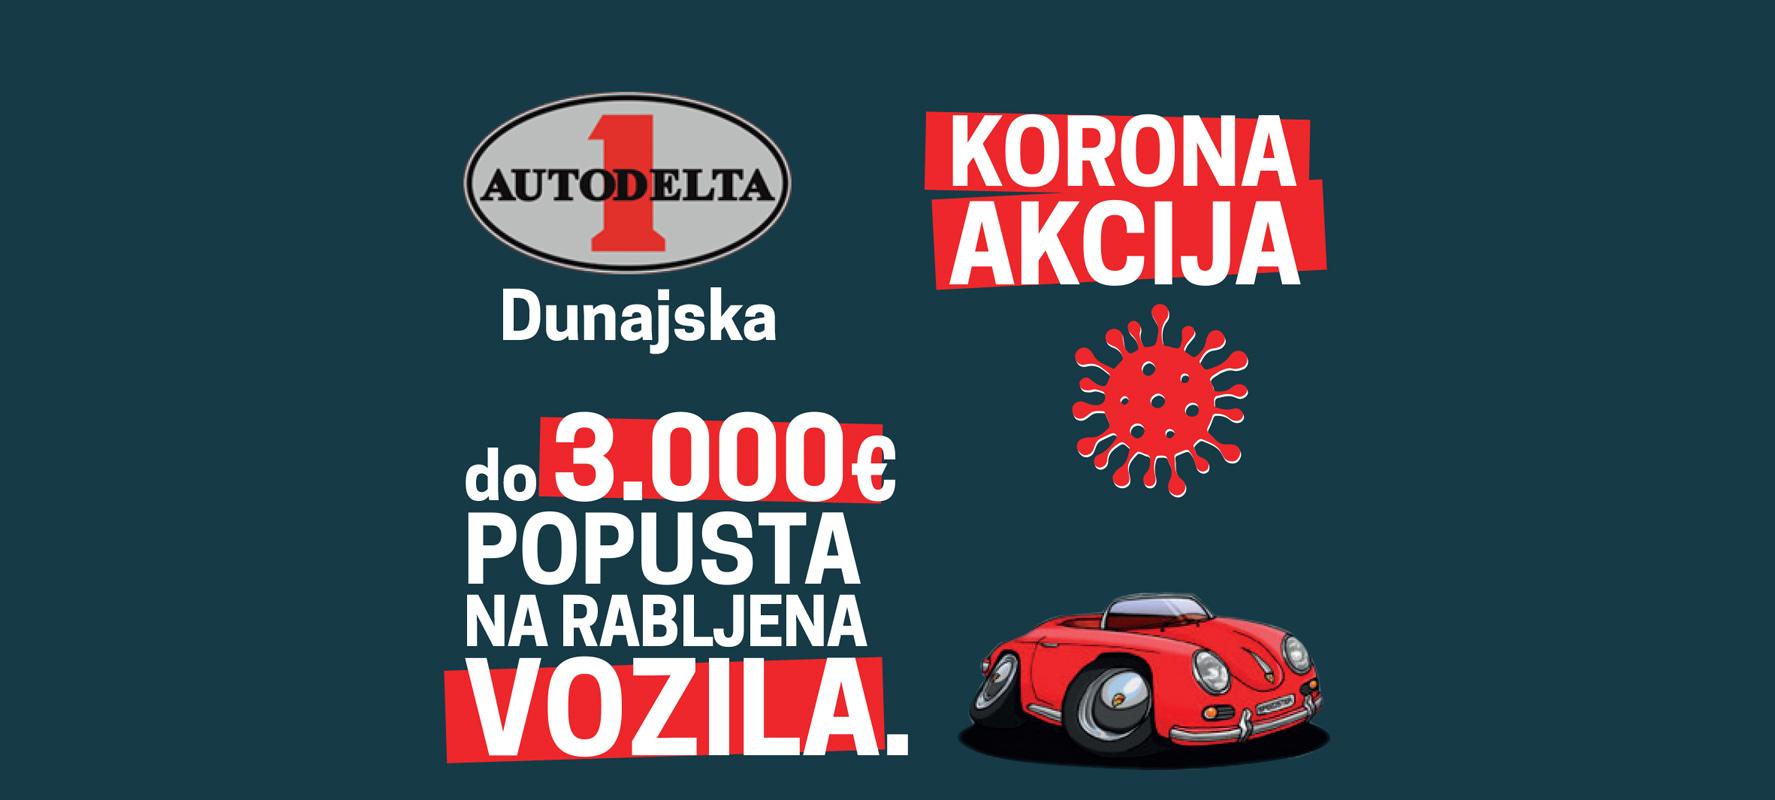 Autodelta rabljena vozila - korona akacija